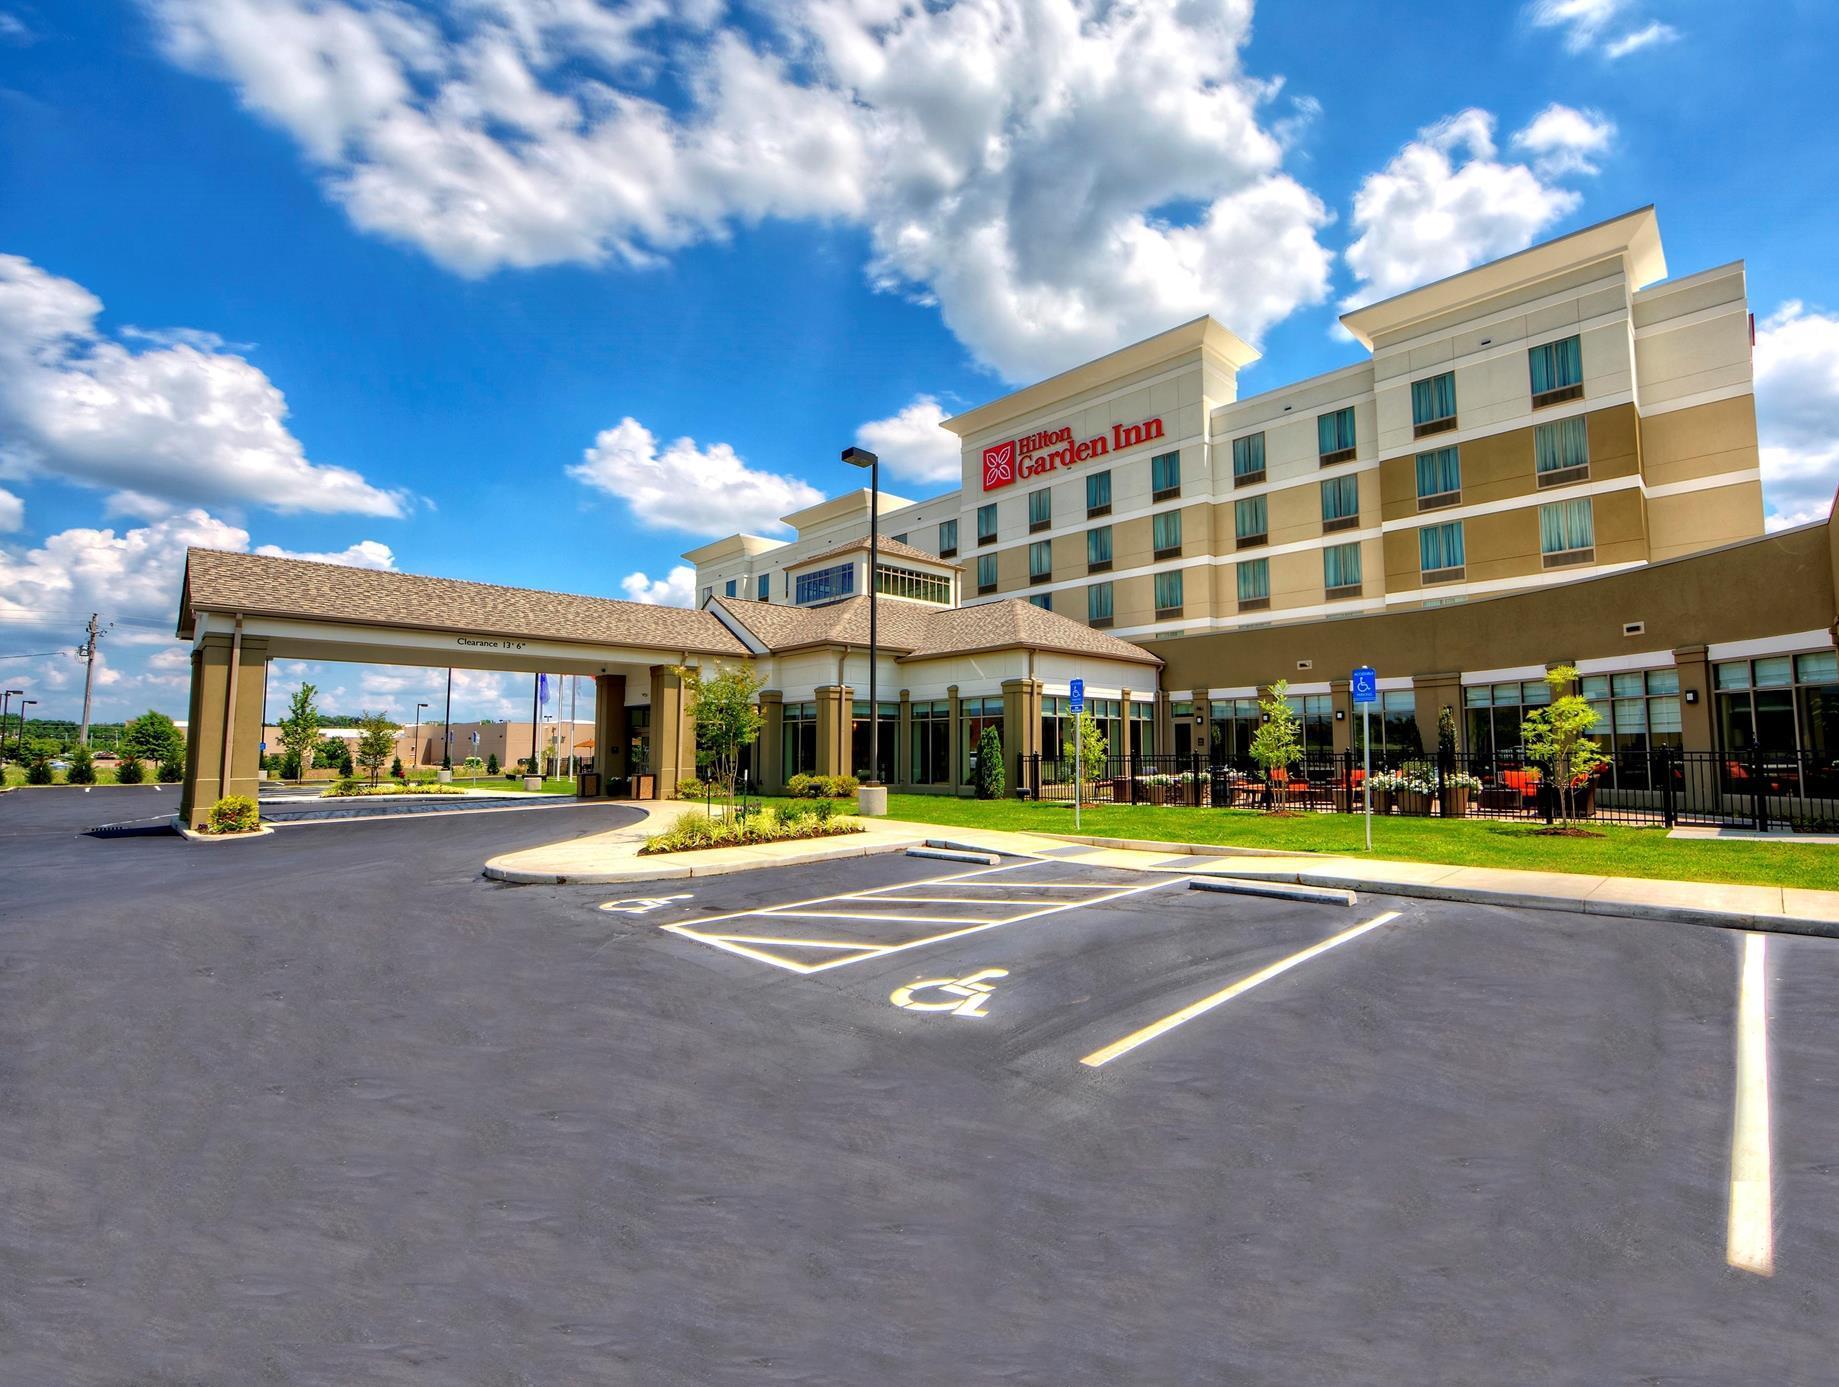 Hilton Garden Inn Memphis Wolfchase Galleria